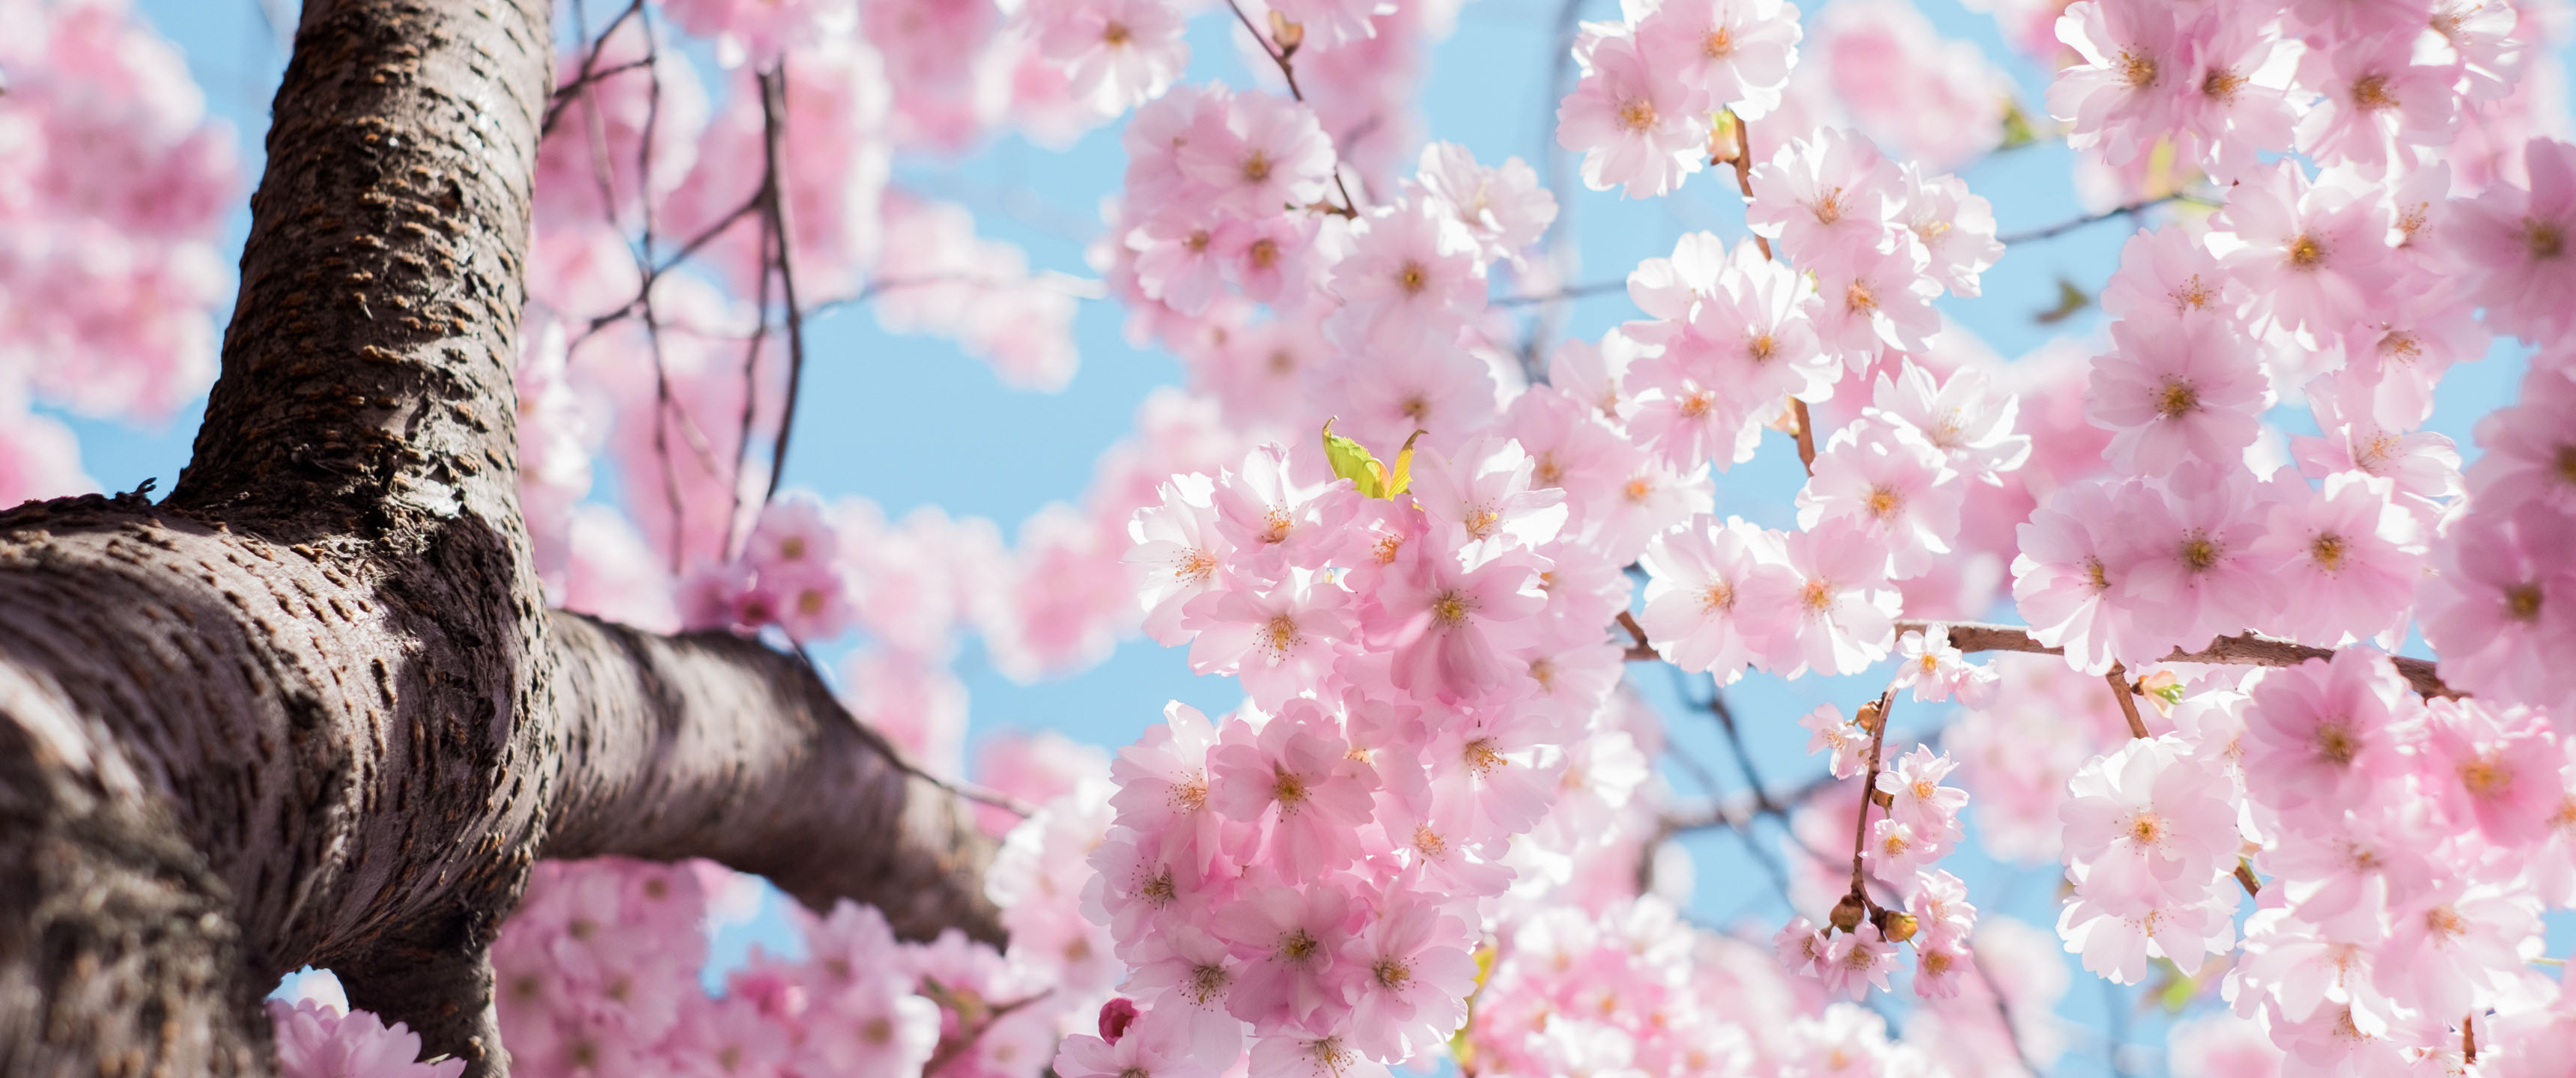 Cherry Blossom Season 21:9 Wallpaper   Ultrawide Monitor ...